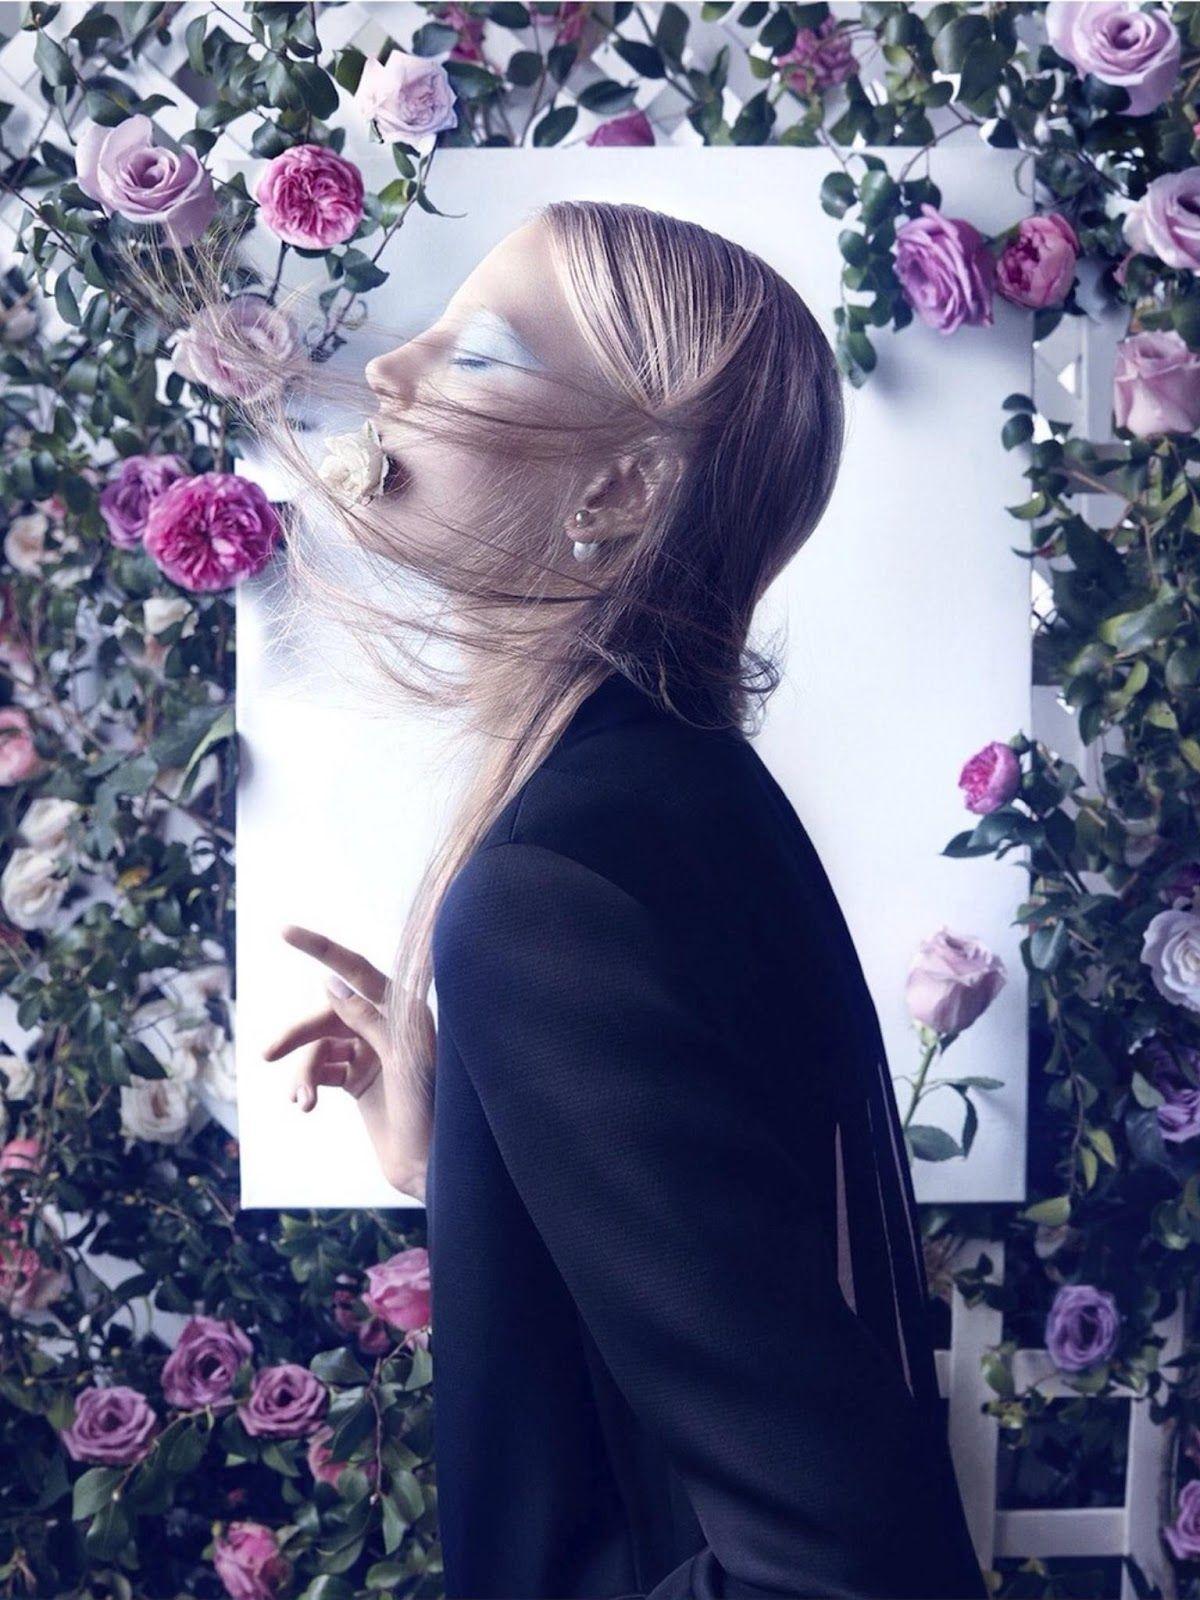 visual optimism; fashion editorials, shows, campaigns & more!: morning dew: elisabeth erm by camilla akrans for dior magazine #5 spring 2014...